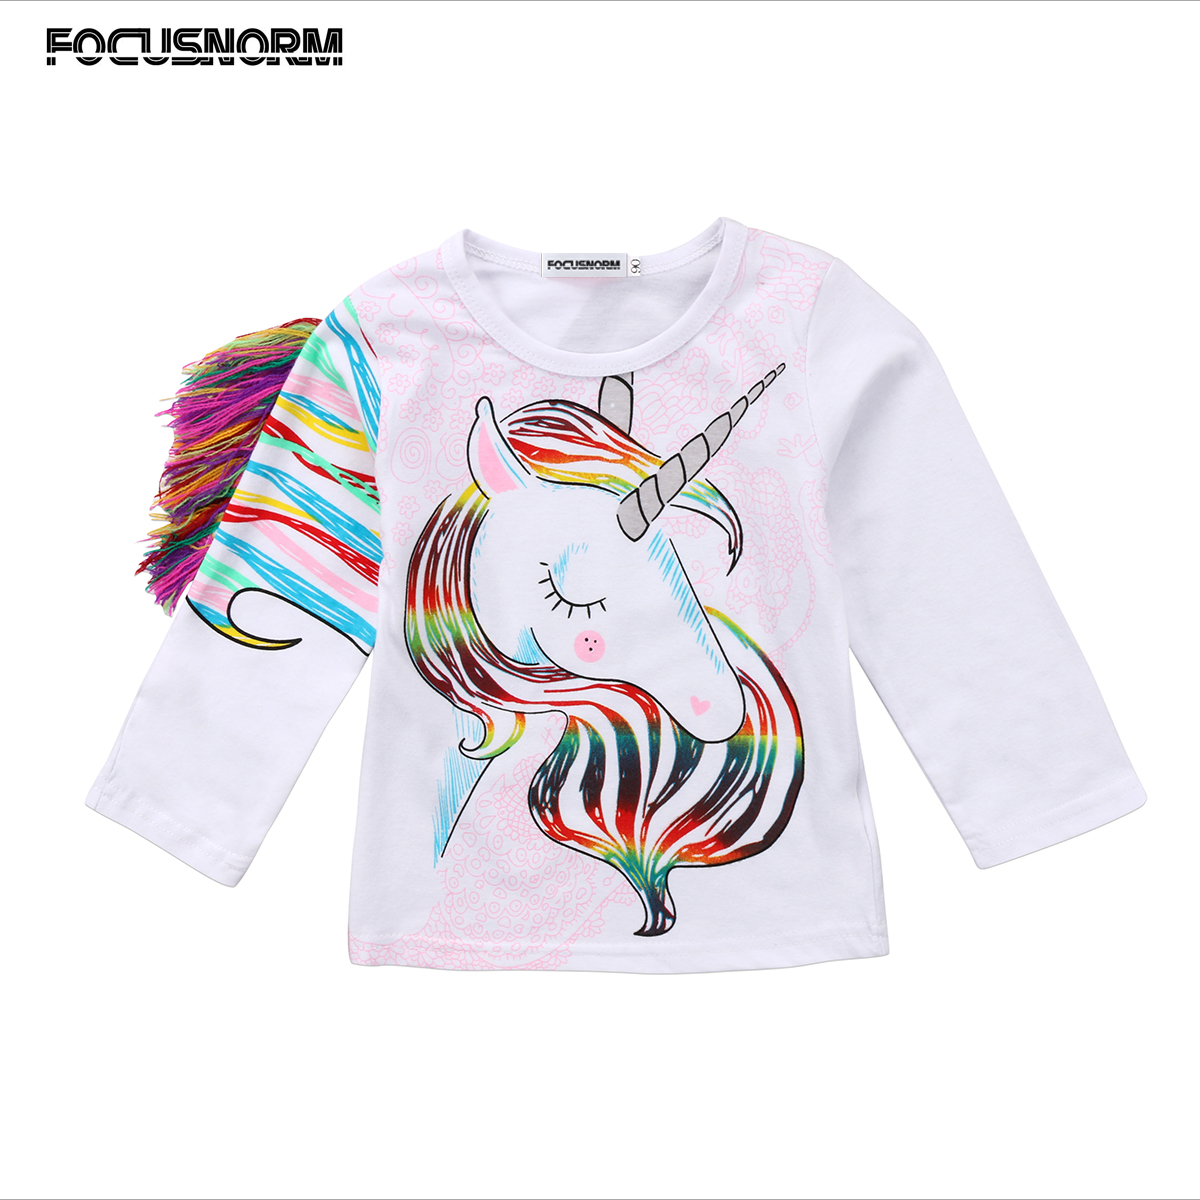 Toddler Kids Girls Autumn Long Sleeve Cartoon Clothes Tops Tassel Unicorn Long Sleeves Sweater Clothes 1-6Y long sleeves layered swing sweater dress